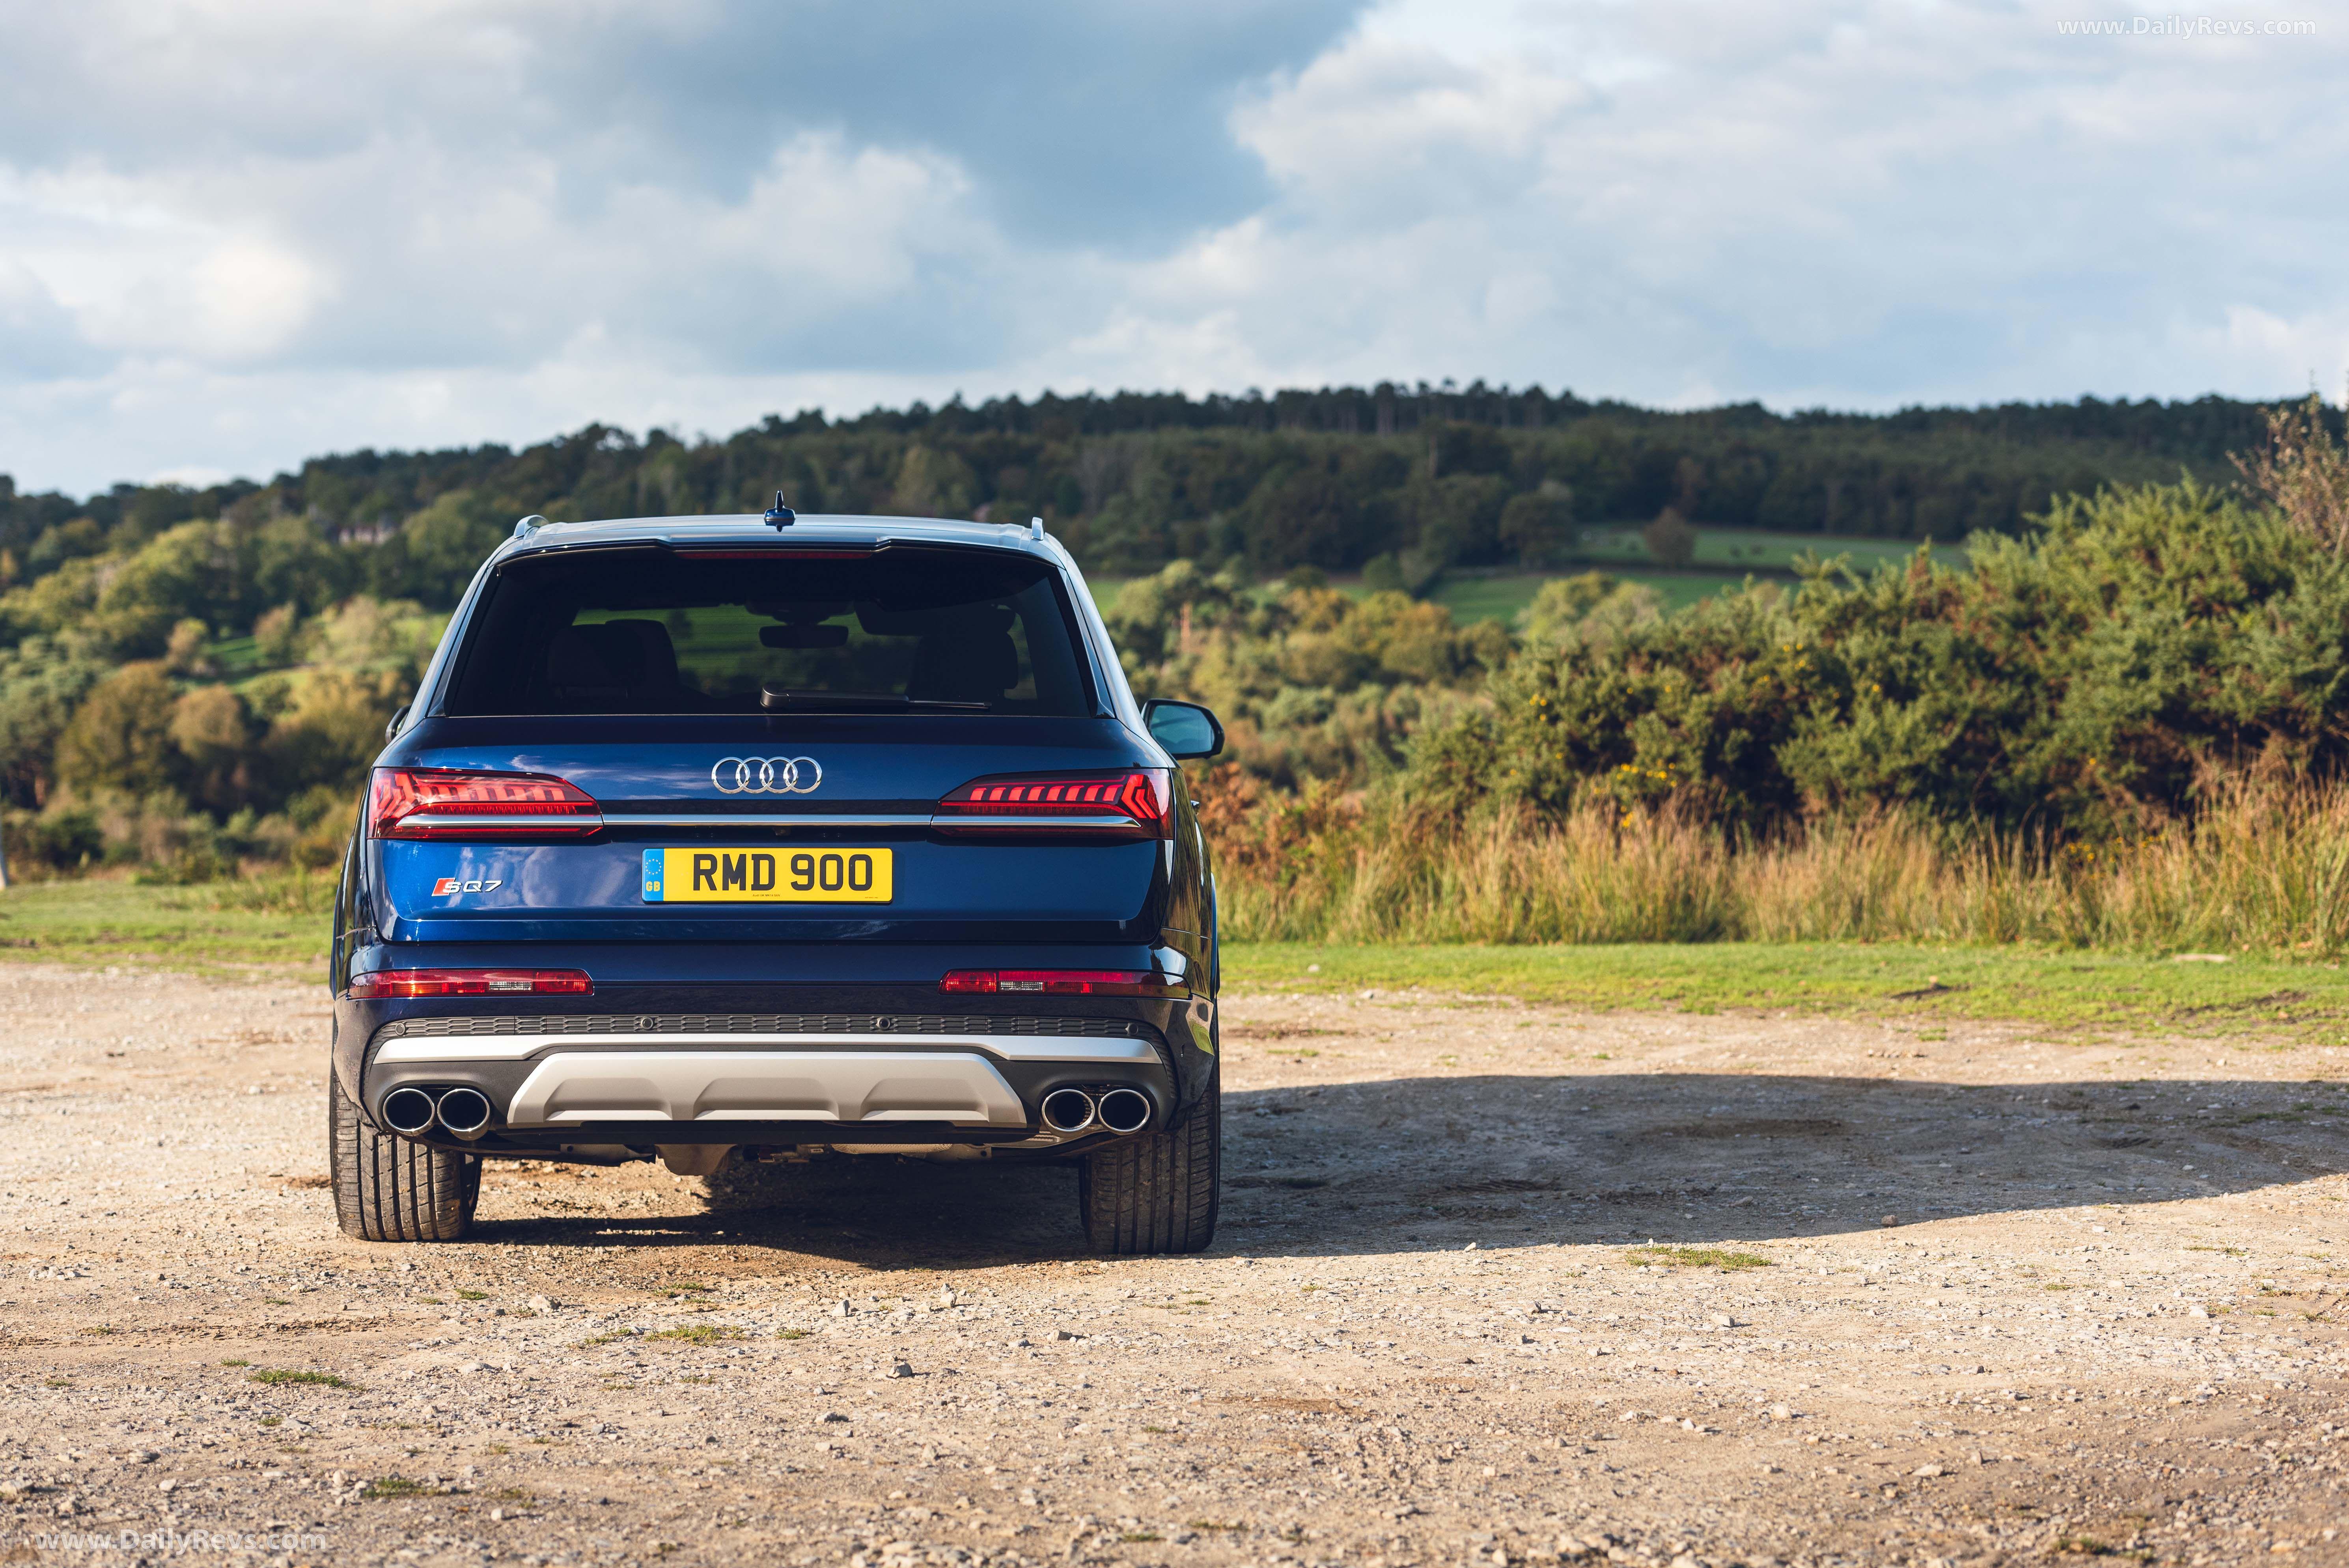 2020 Audi Sq7 Tdi Uk Dailyrevs Com Audi Tdi Diesel Engine